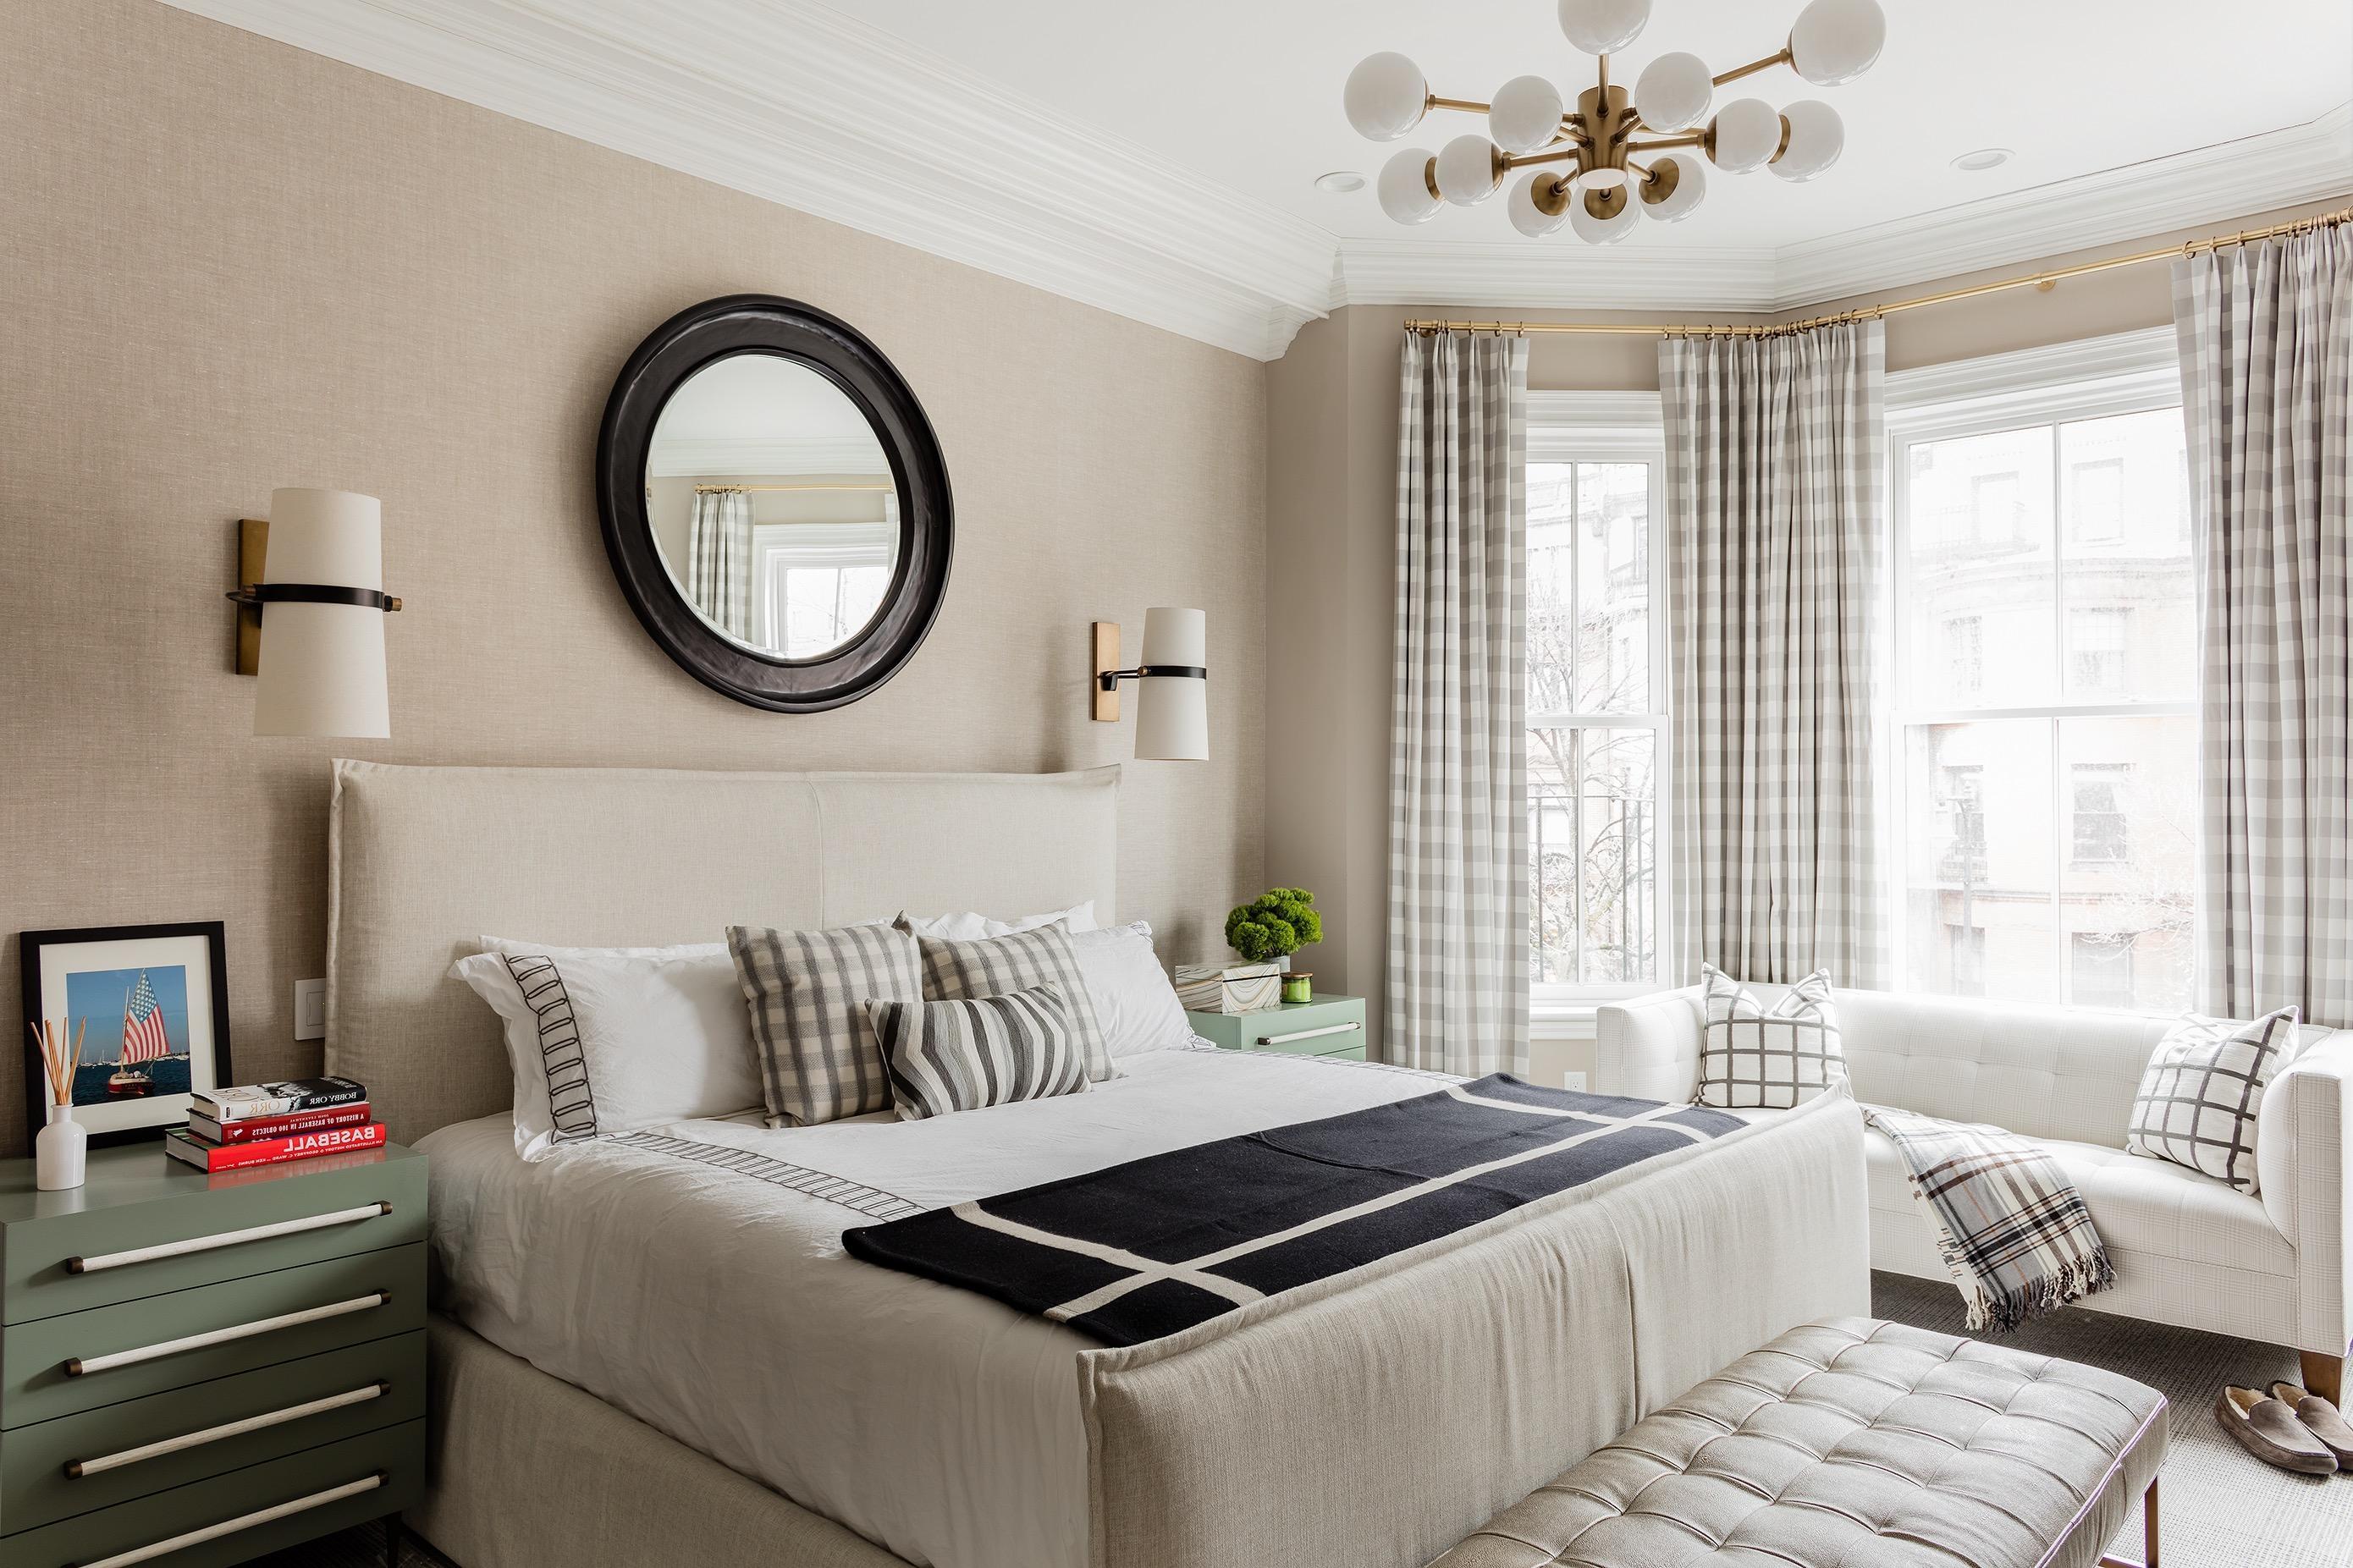 Bedroom Furniture : Bedroom Sofa Set Latest Bedroom Sofa Designs Pertaining To Bedroom Sofa Chairs (View 17 of 20)